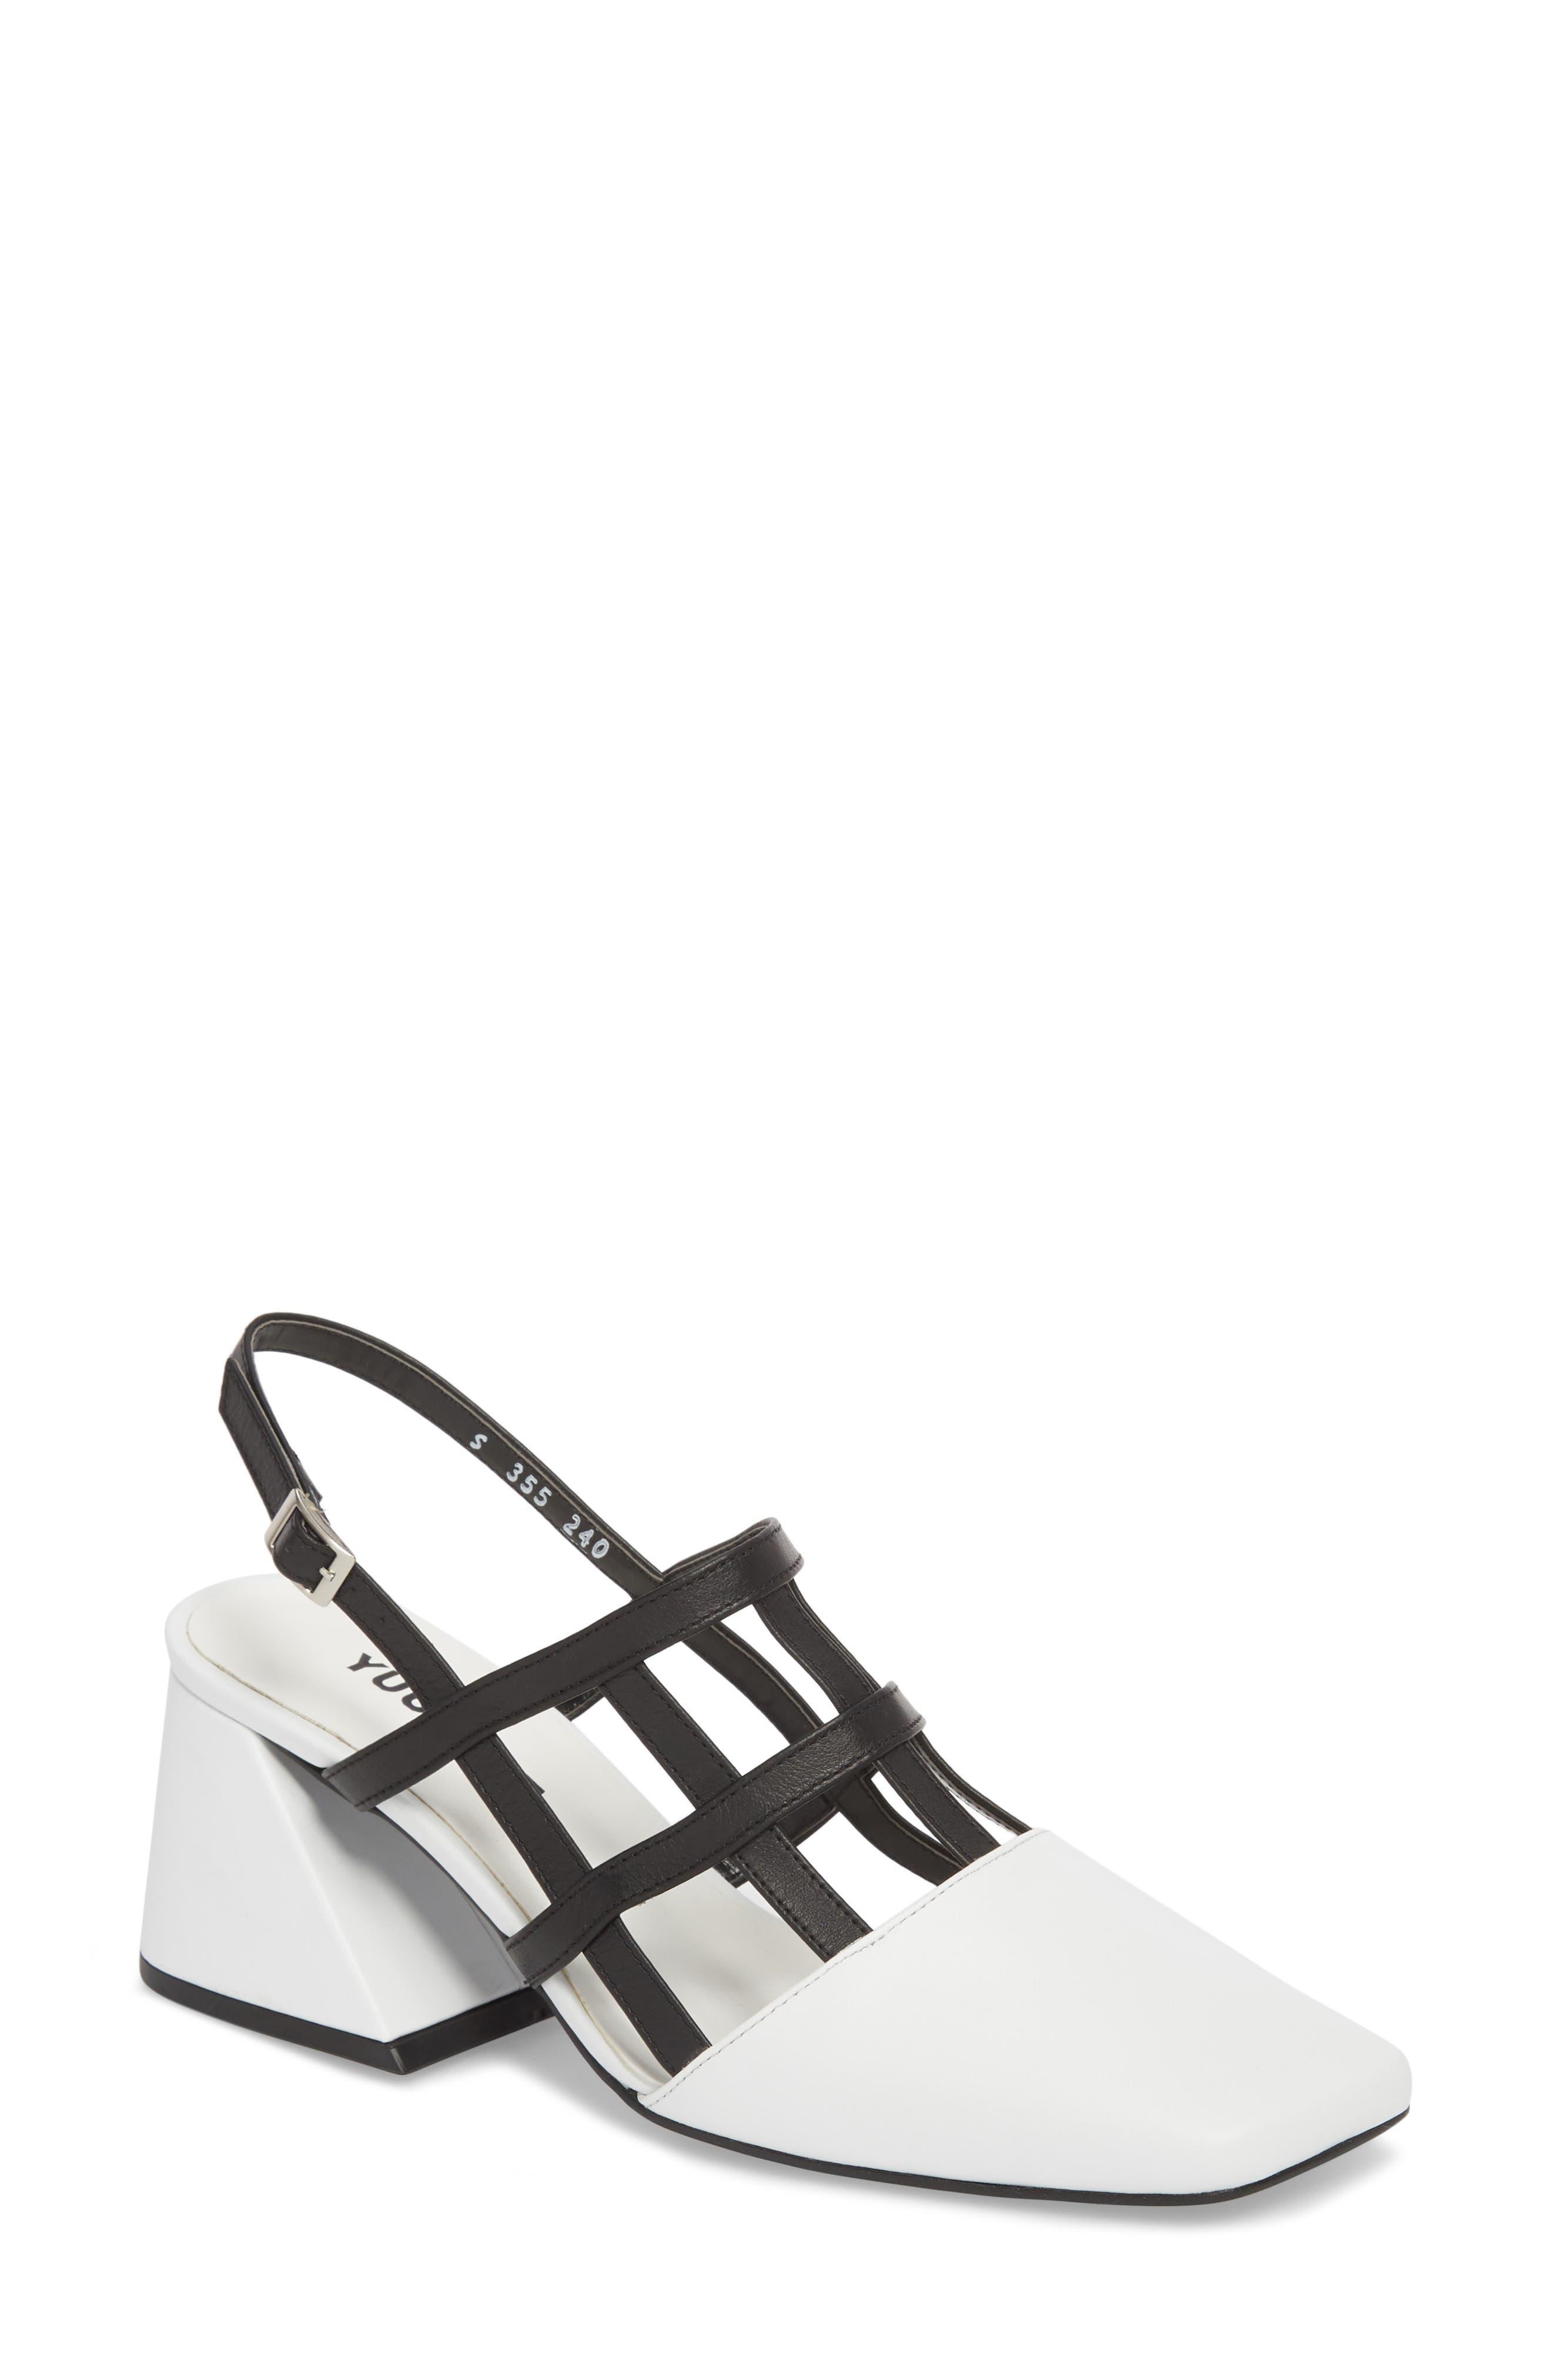 Caged Slingback Pump,                             Main thumbnail 1, color,                             White/ Black